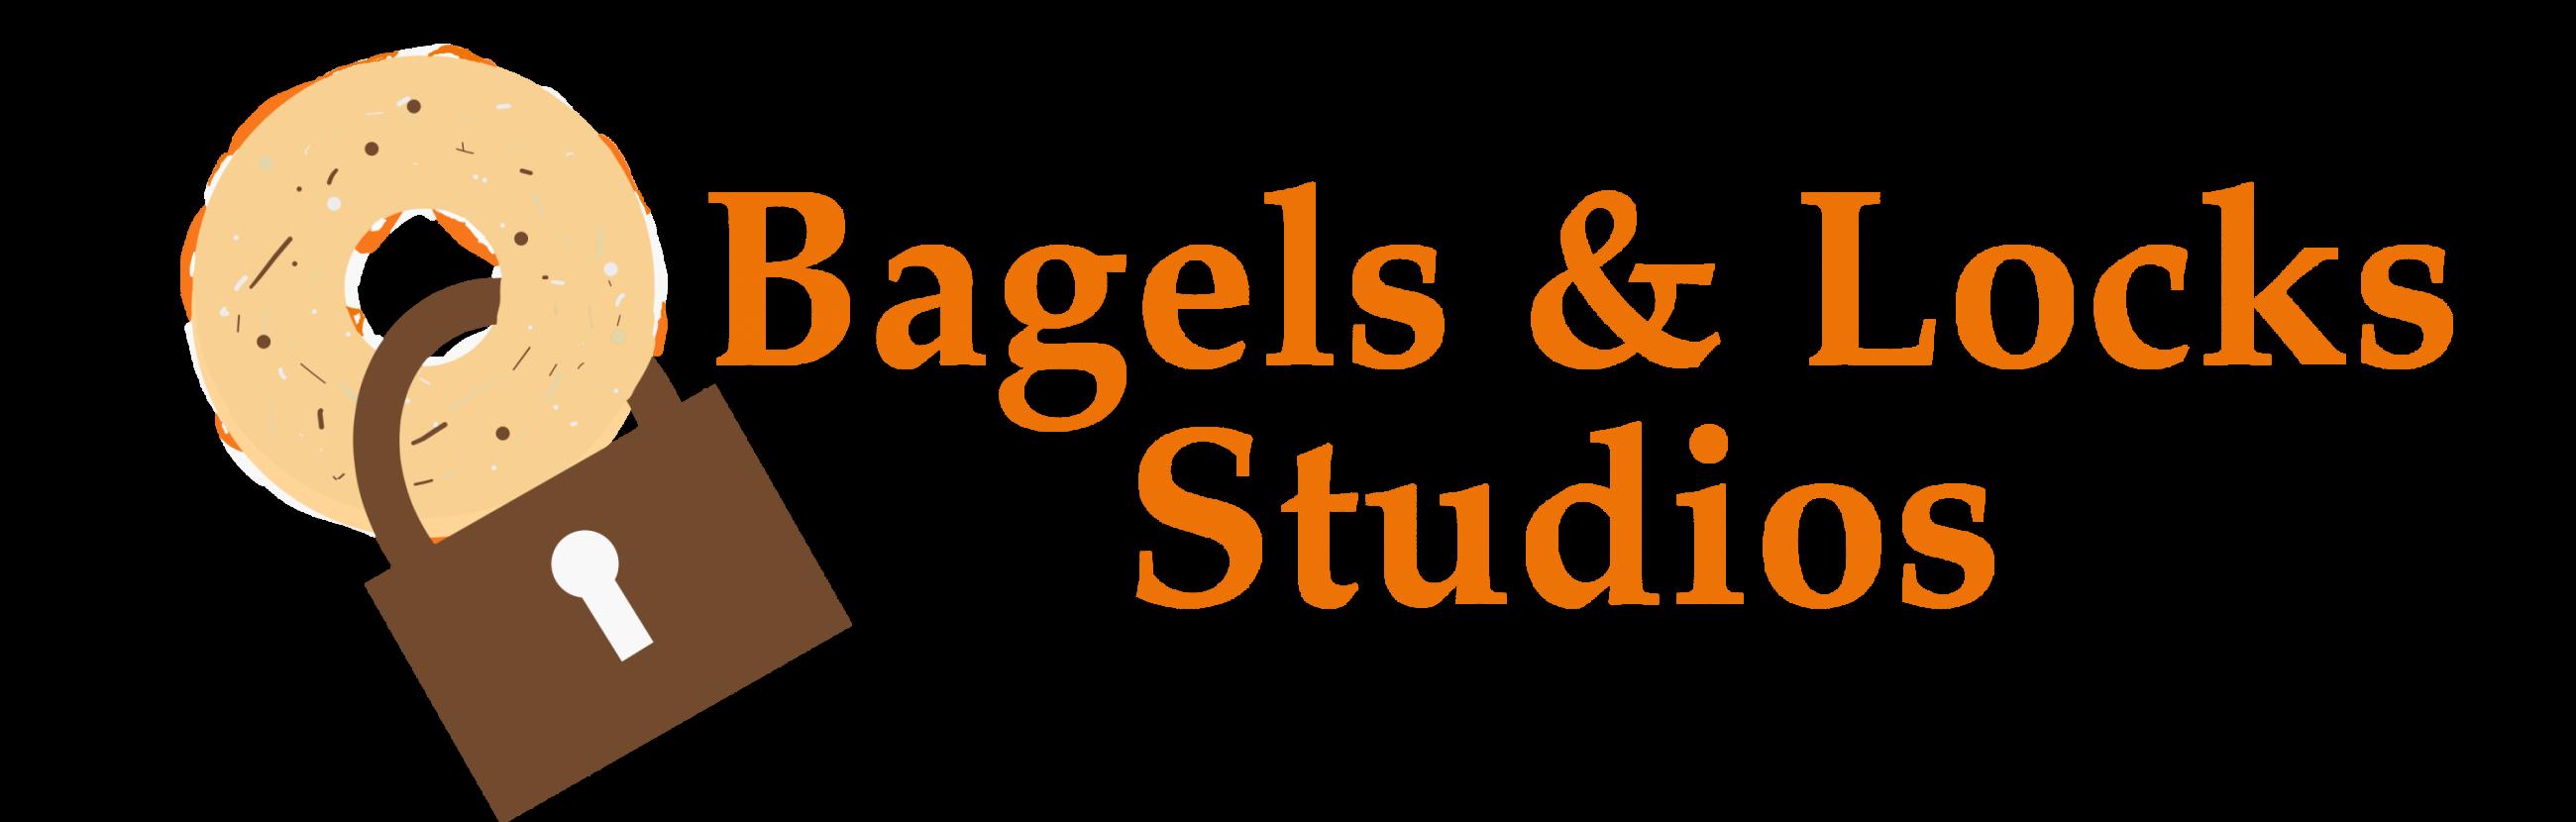 Bagels & Locks Studios